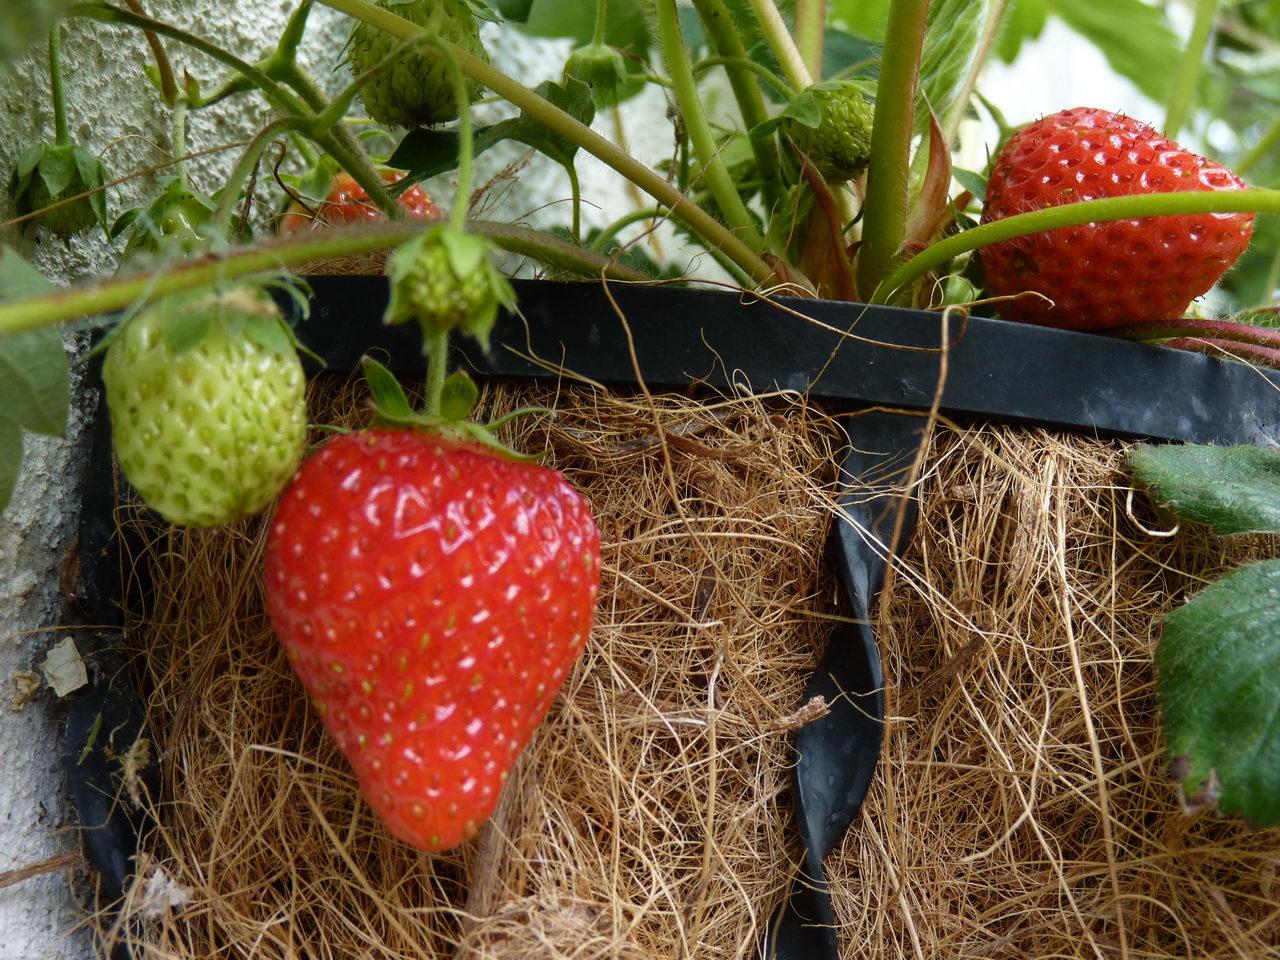 http://nargil.ir/plant/images/pic/641/Fragaria%20Ananassa_18.jpg